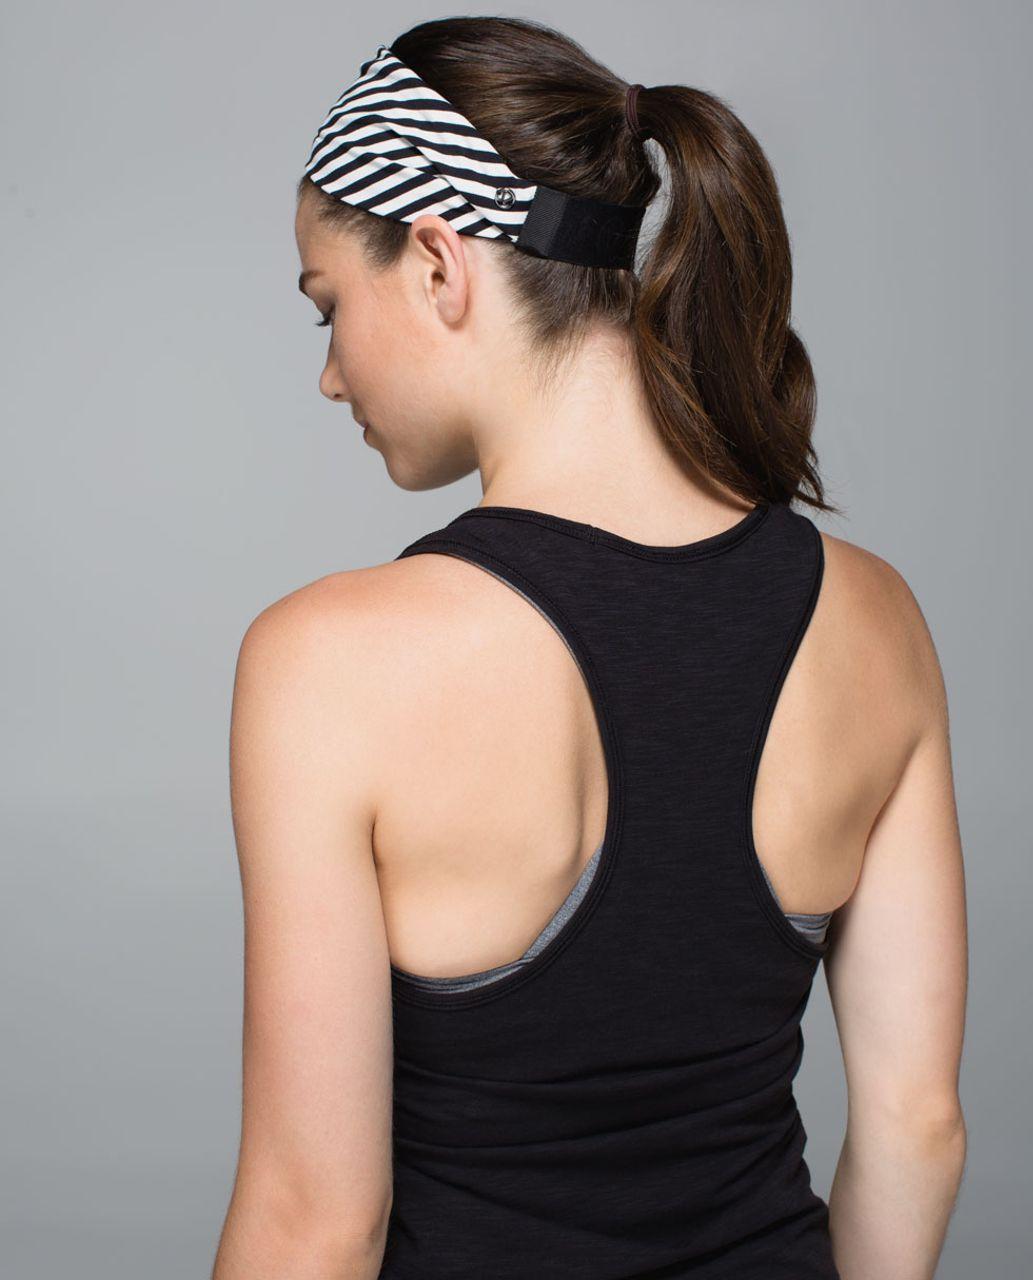 Lululemon Fringe Fighter Headband - Narrow Bold Stripe Black Angel Wing / Black